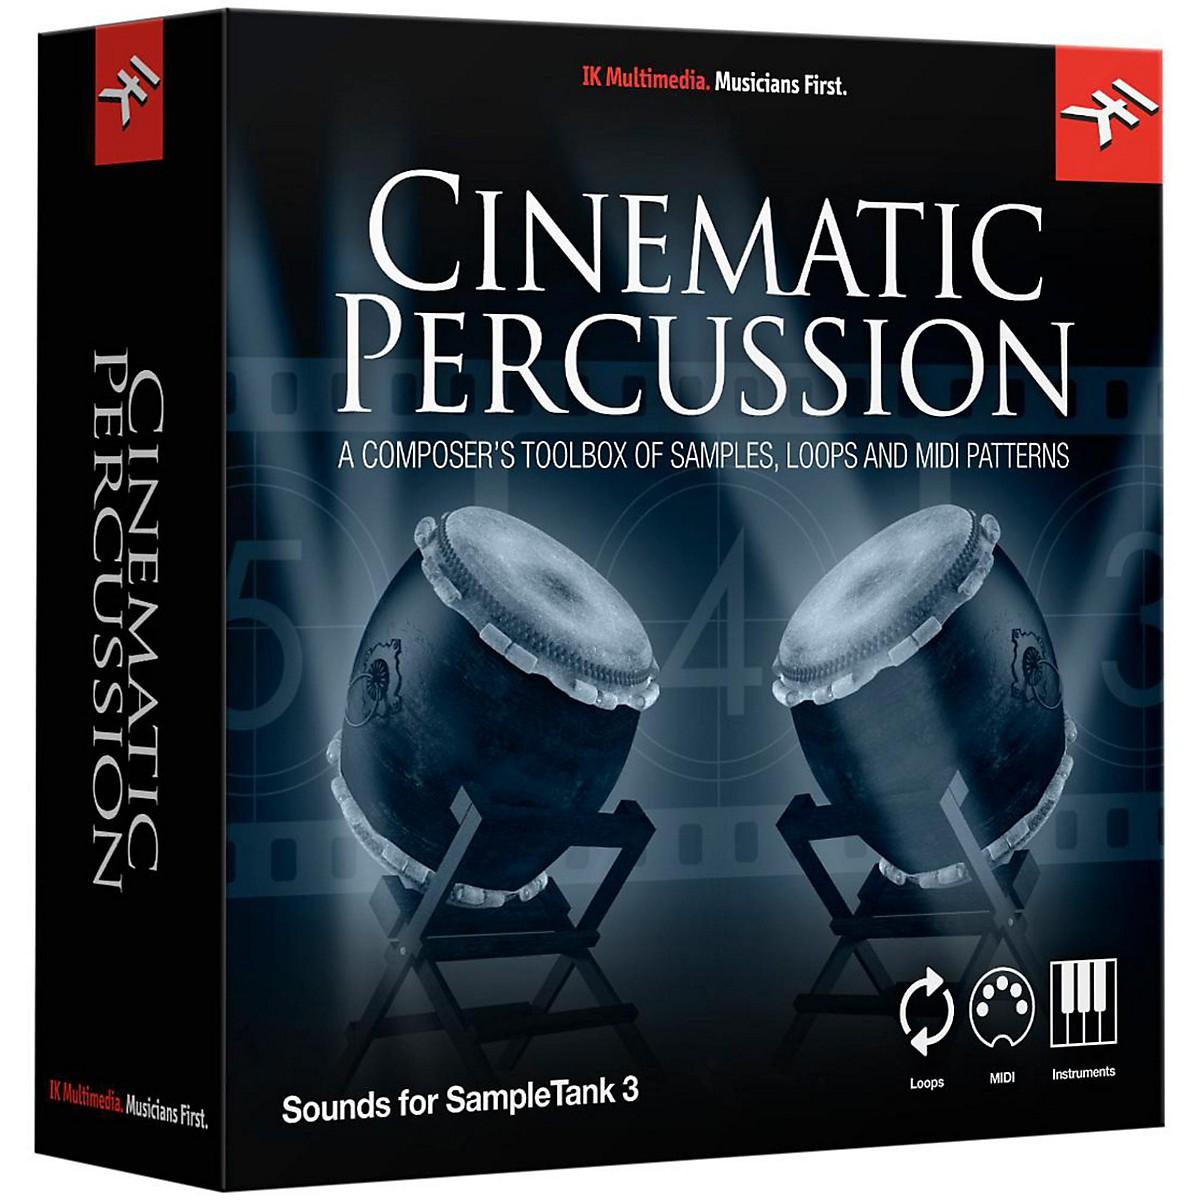 IK Multimedia SampleTank 3 Instrument Collection - Cinematic Percussion